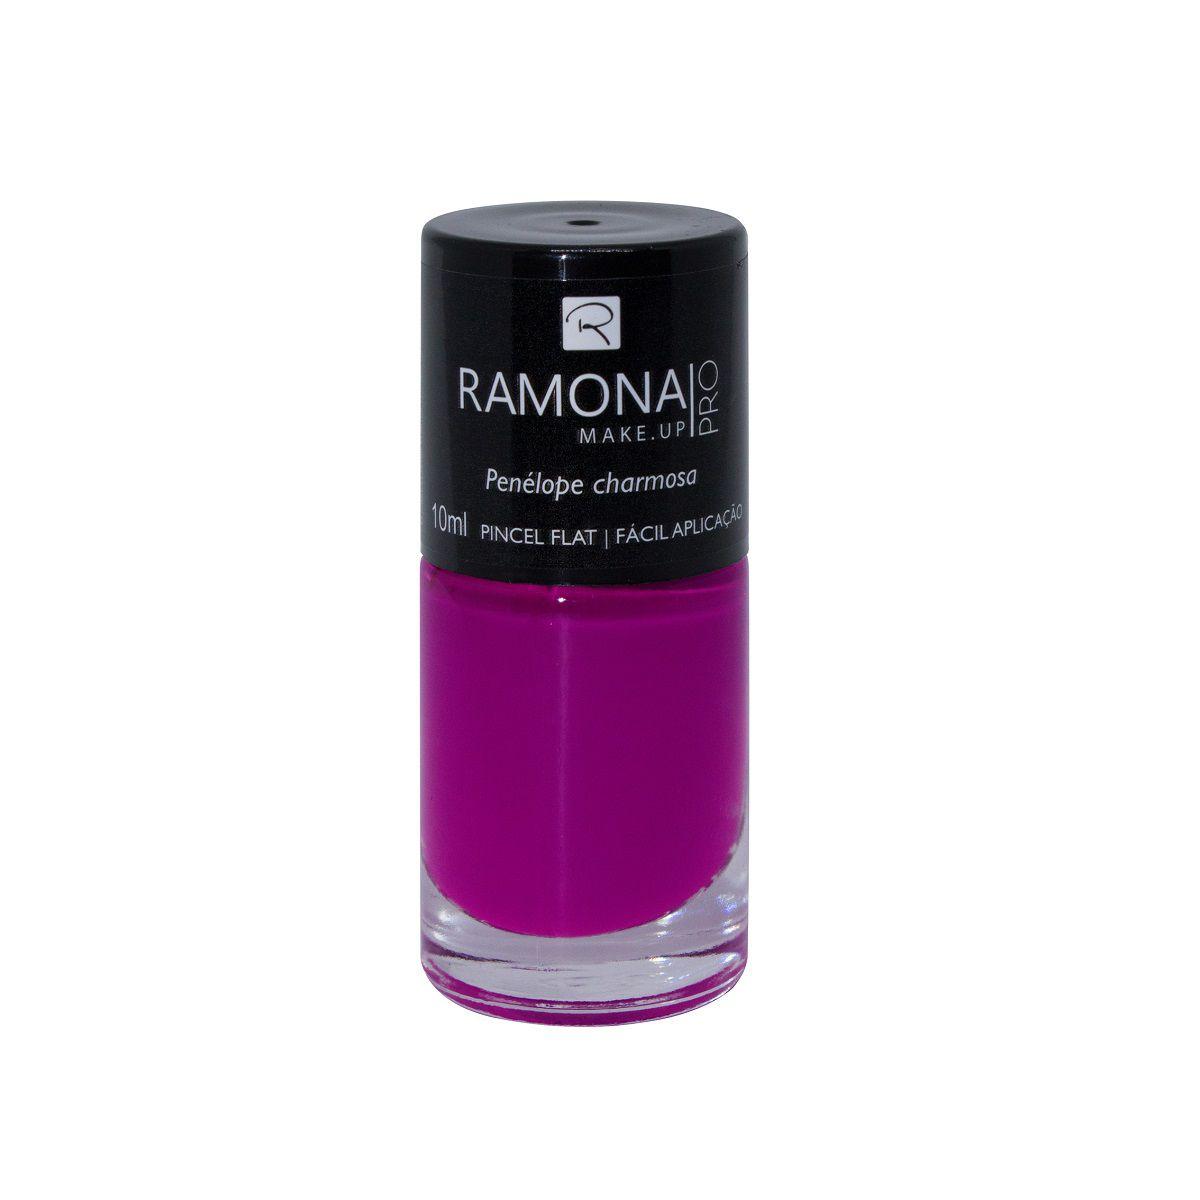 Esmalte cremoso Ramona Cosméticos Penélope charmosa 10ml